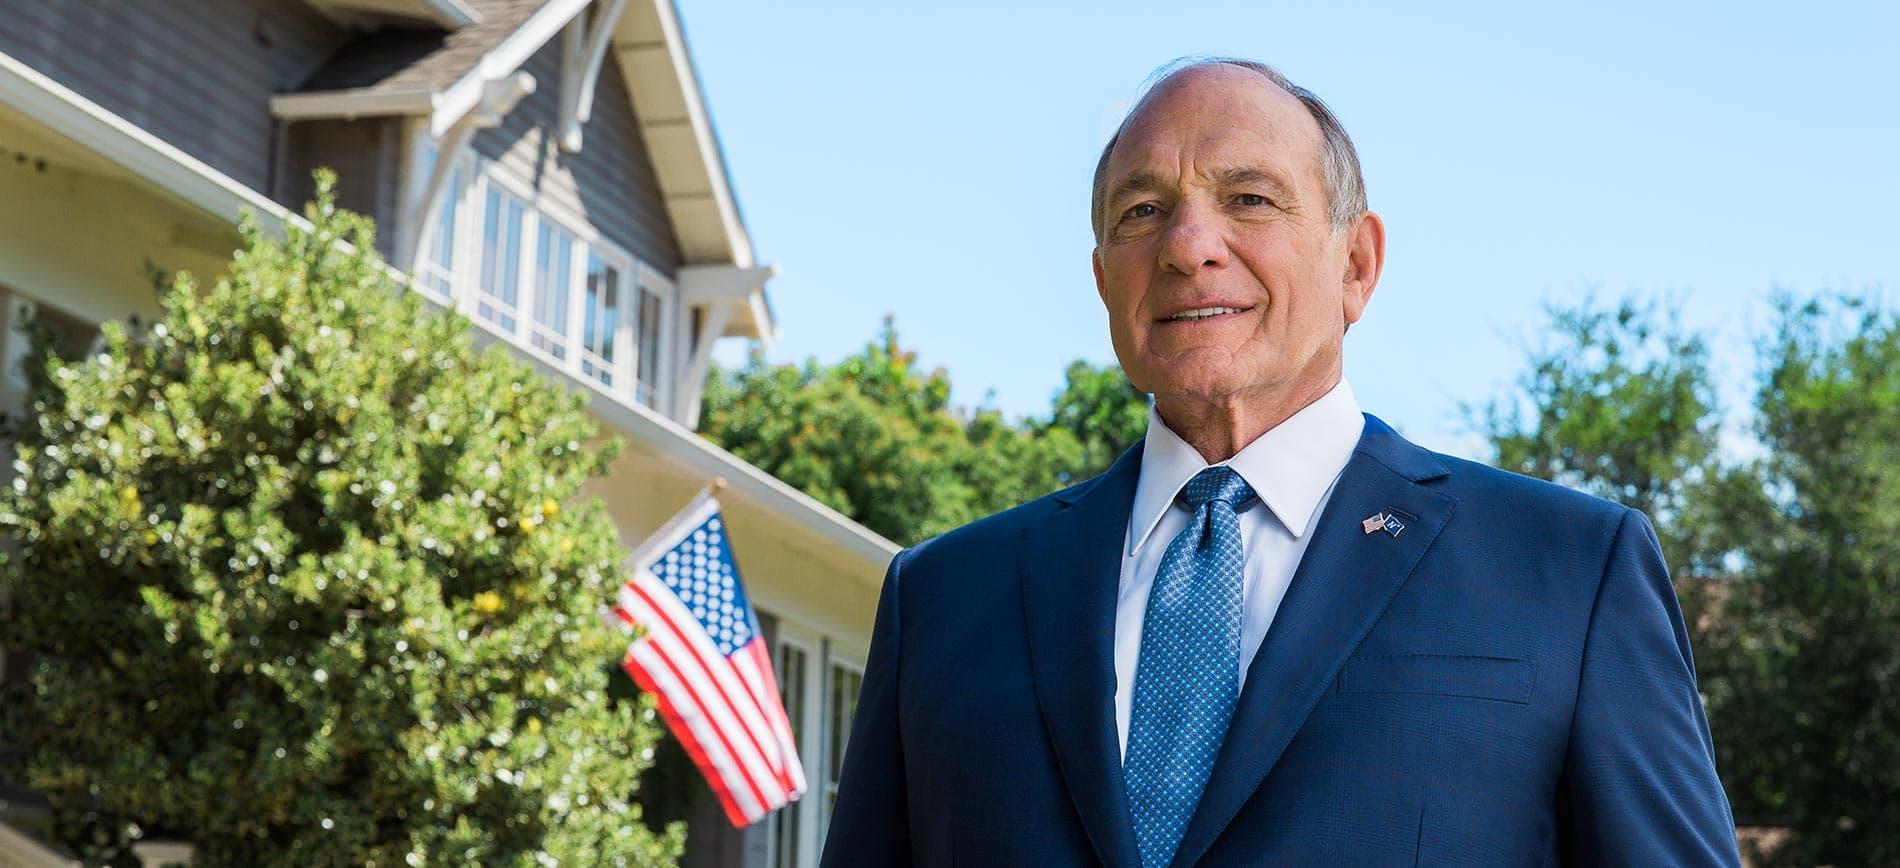 VA Home Loans & Mortgage Refinance for Veterans | NewDay USA